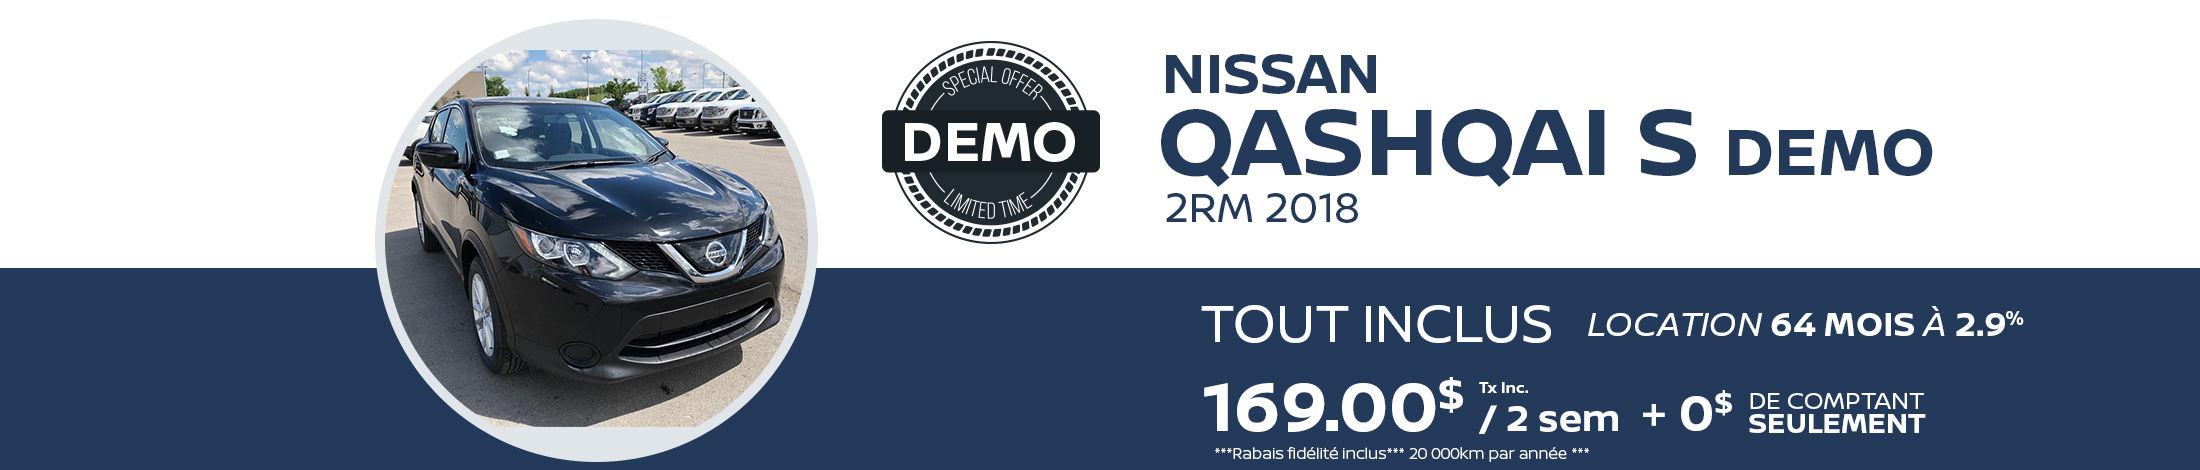 Qashqai S FWD Demo